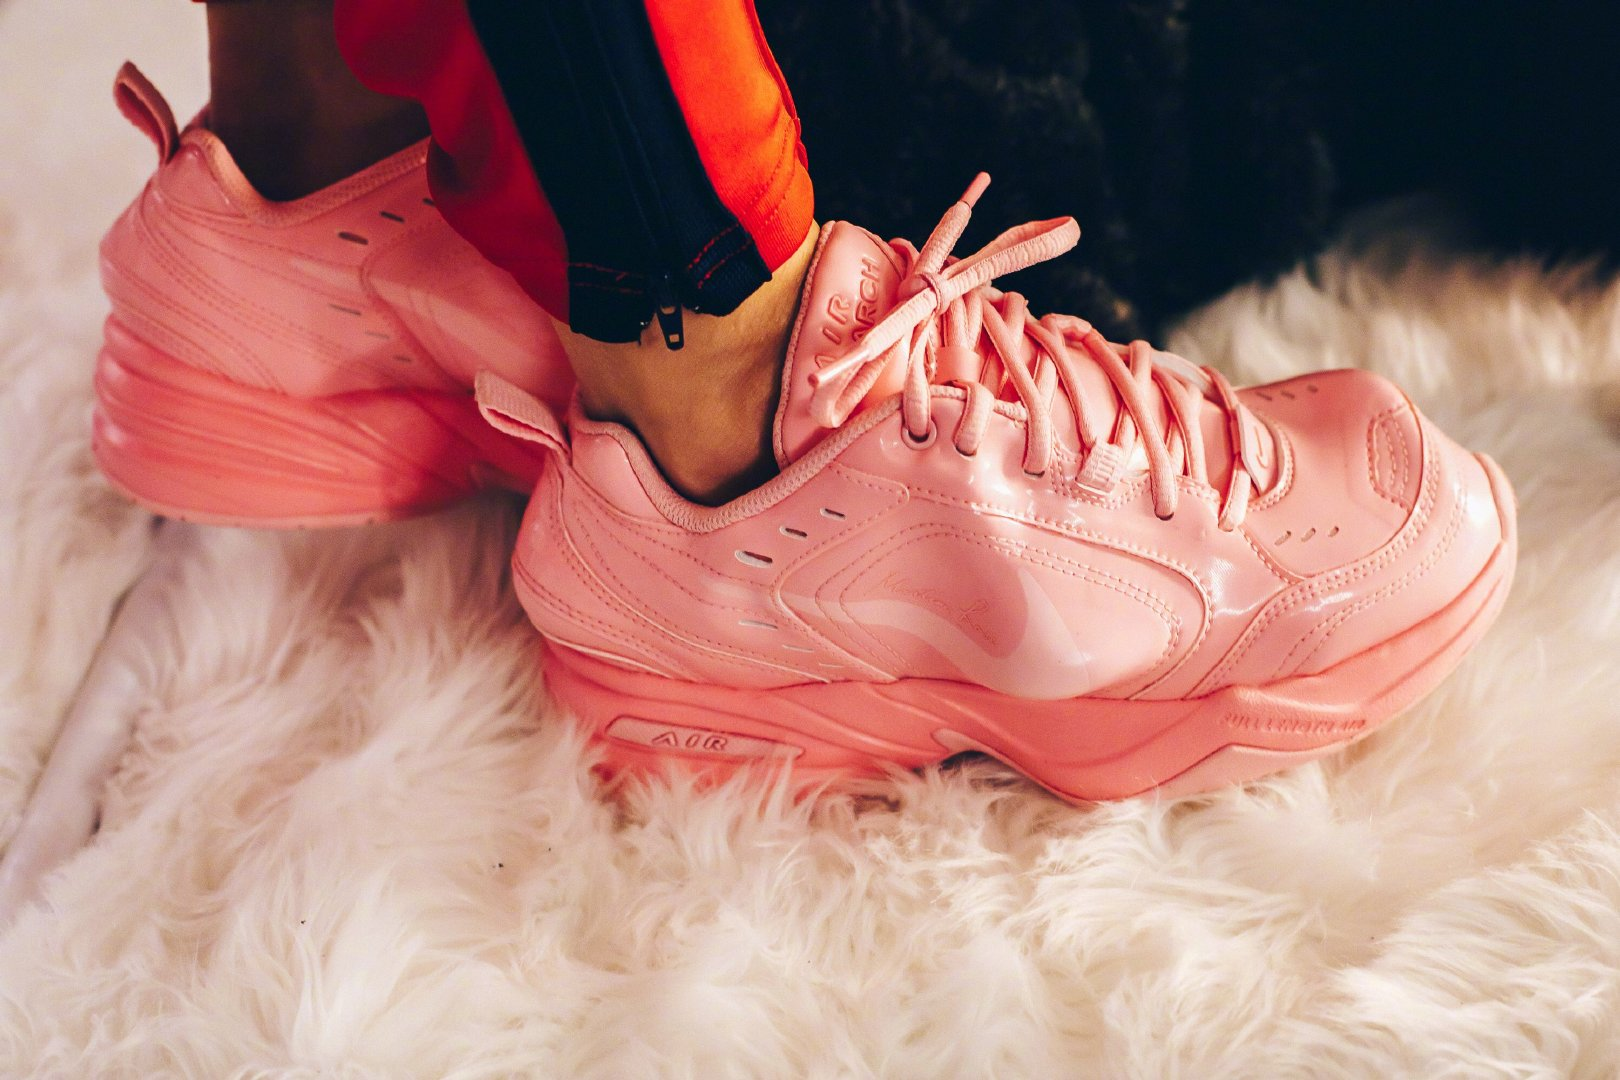 902fc4490b1 Nike Air Monarch IV x Martine Rose,三个配色,三种不同的感觉,售价250美元,有没有喜欢的朋友?  ♀    ♂️images via Sneaker Politics